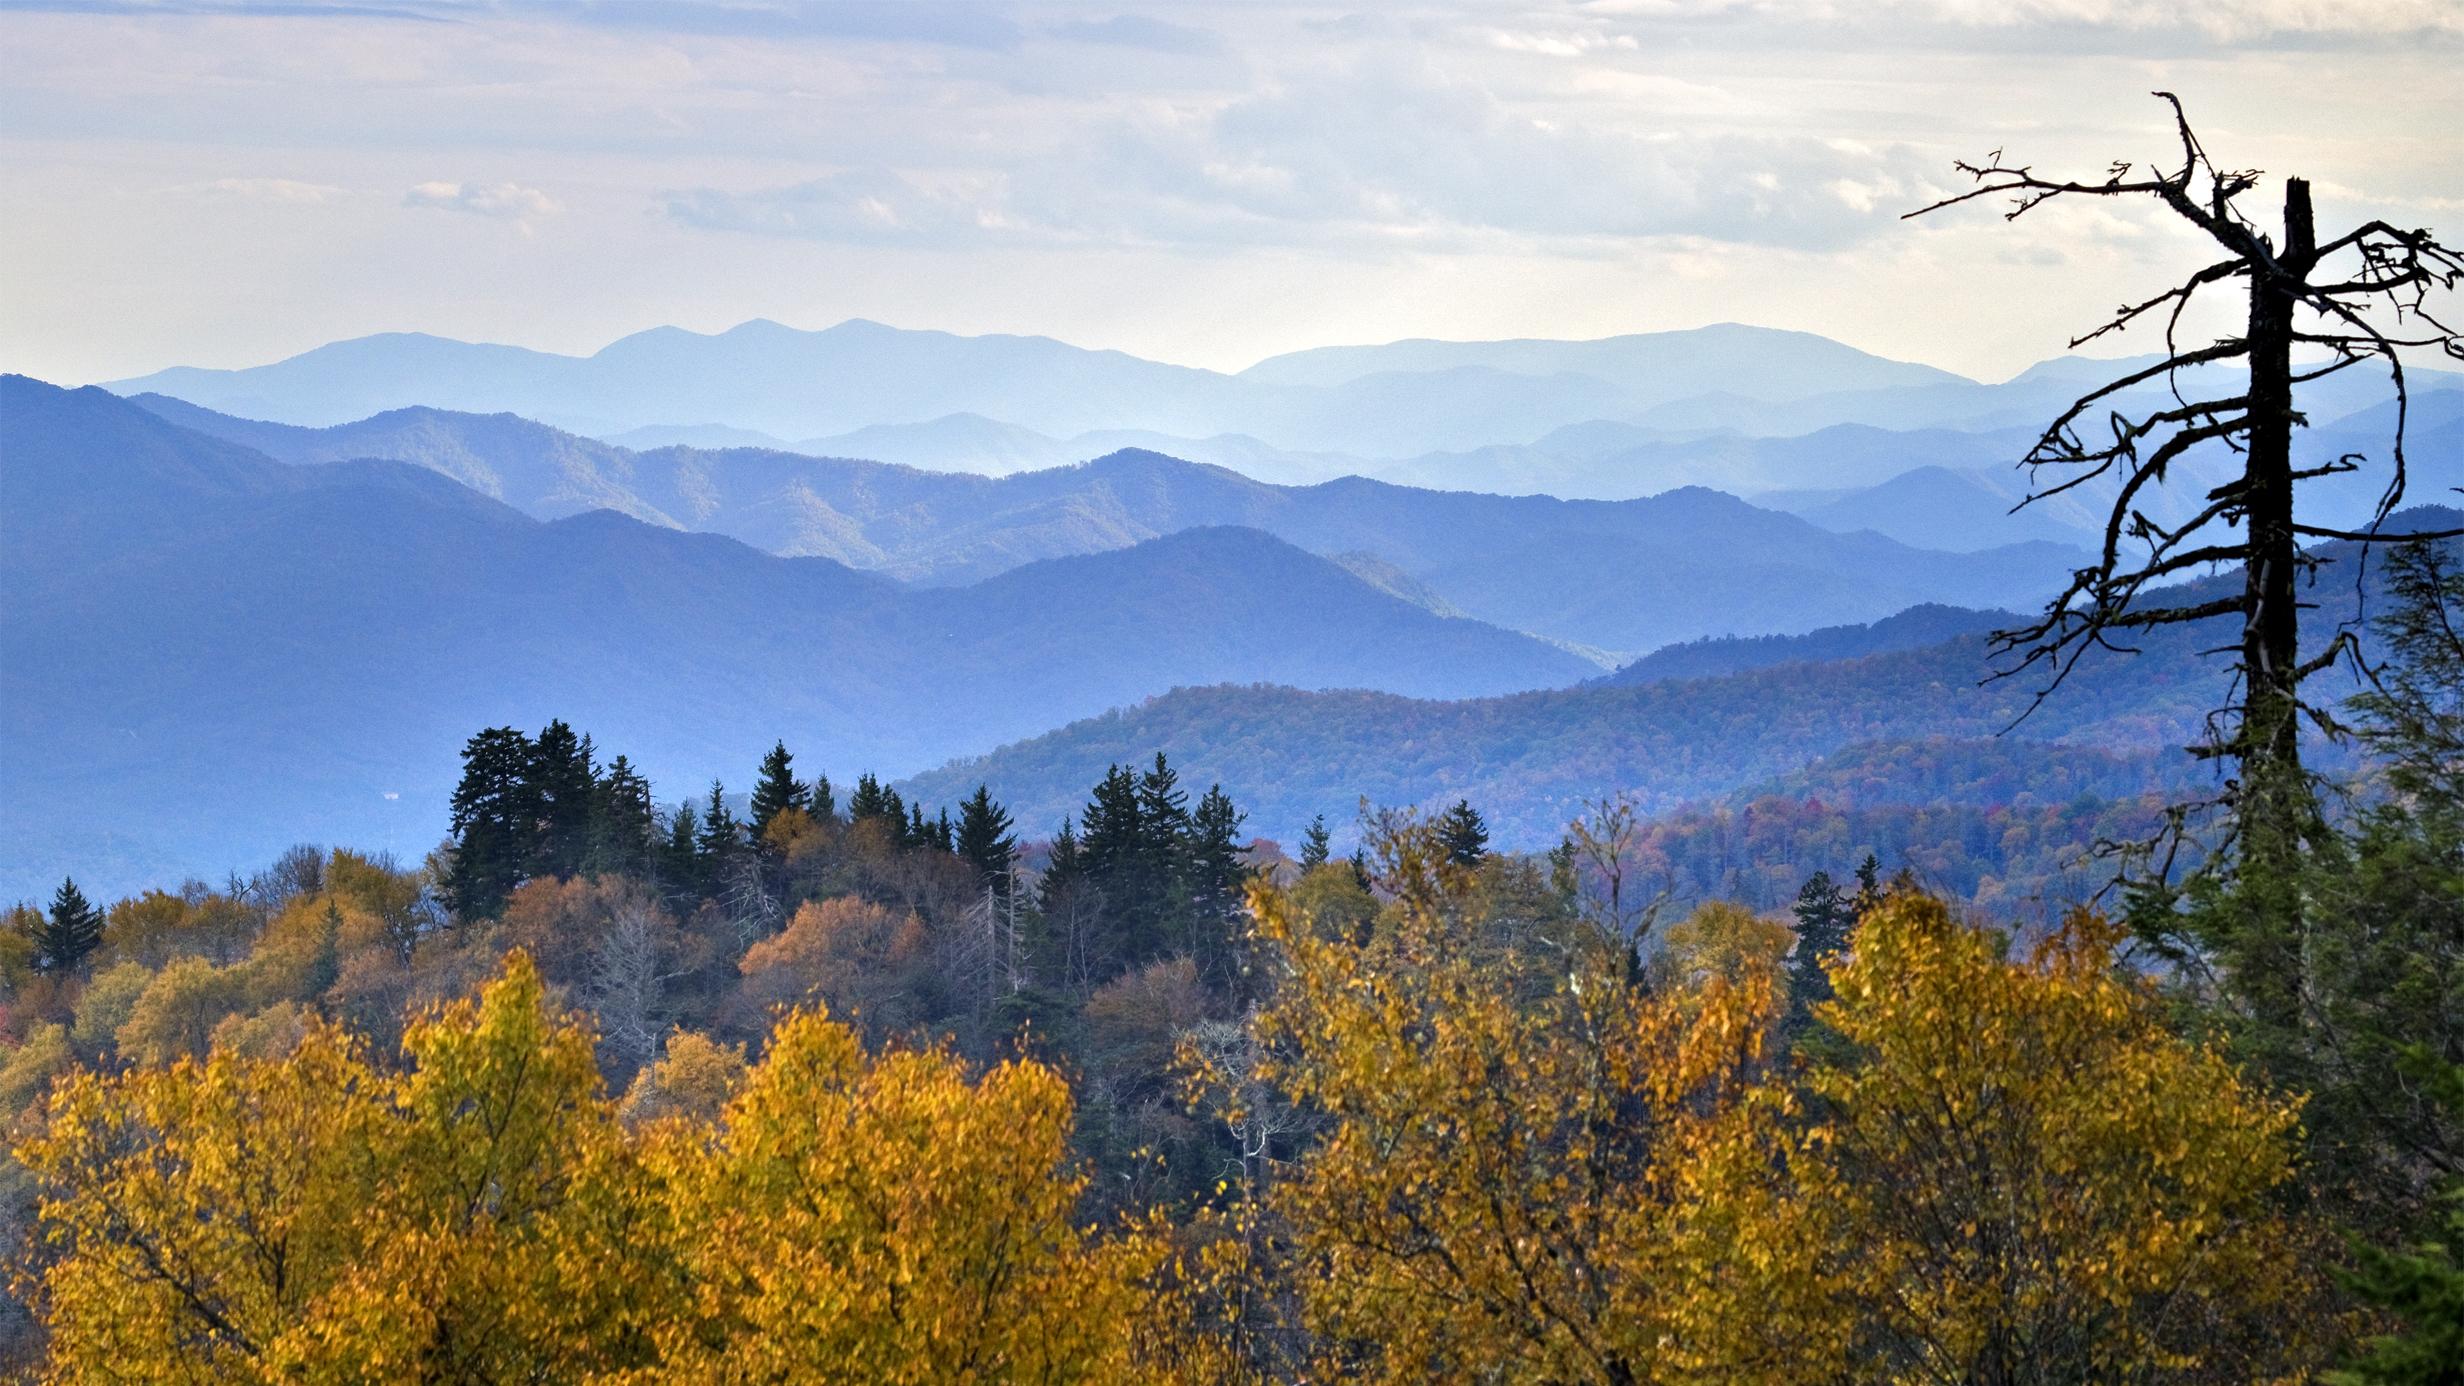 42] Smoky Mountain Wallpaper Desktop on WallpaperSafari 2464x1386